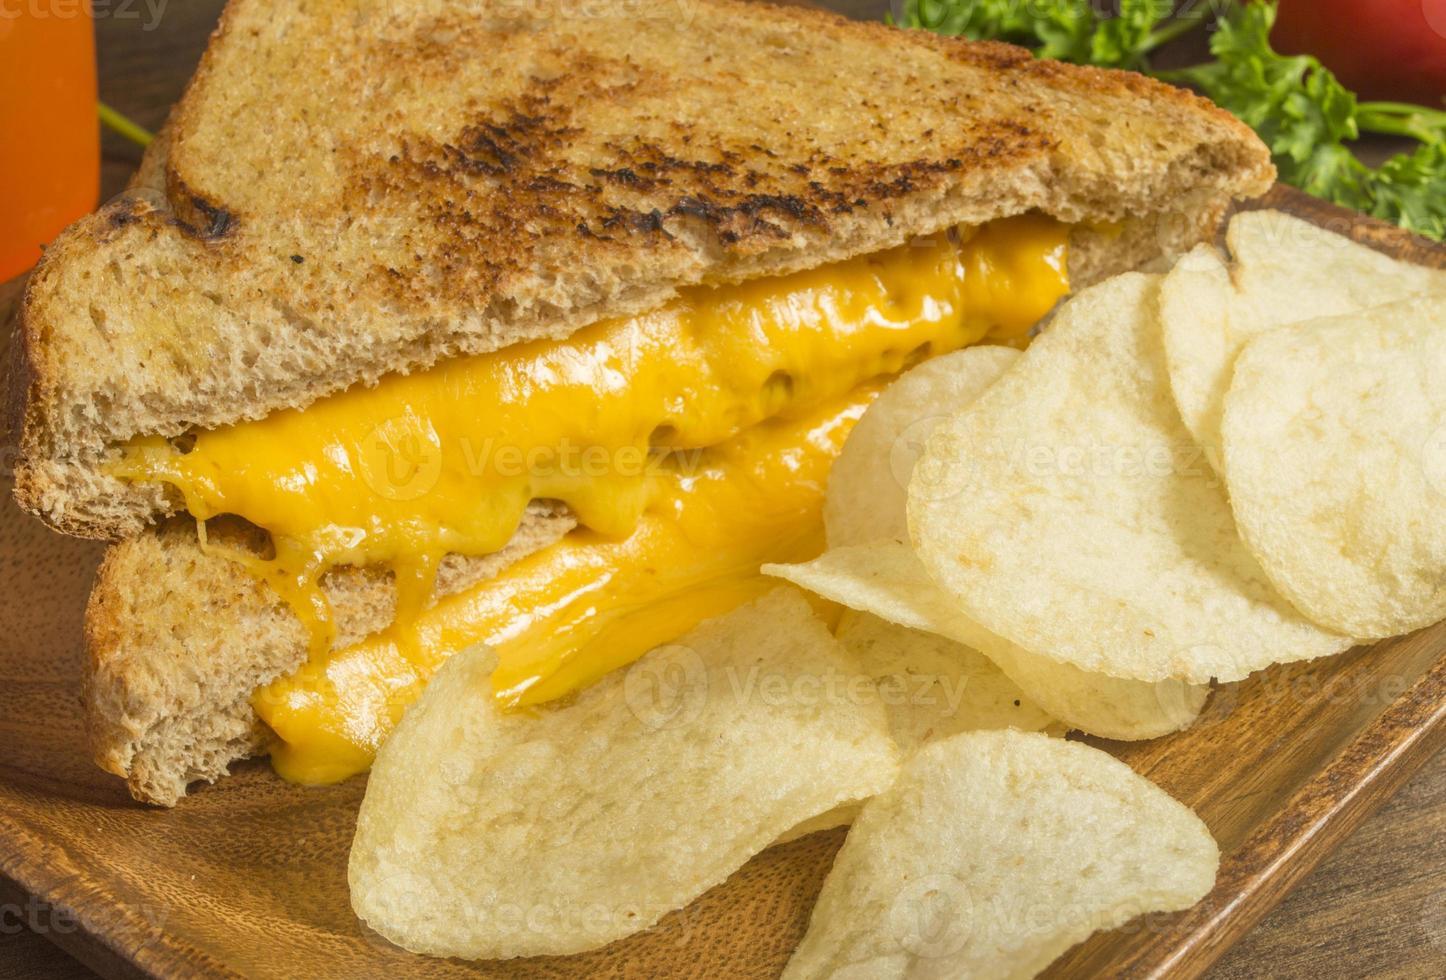 sándwich de queso chedder a la parrilla foto